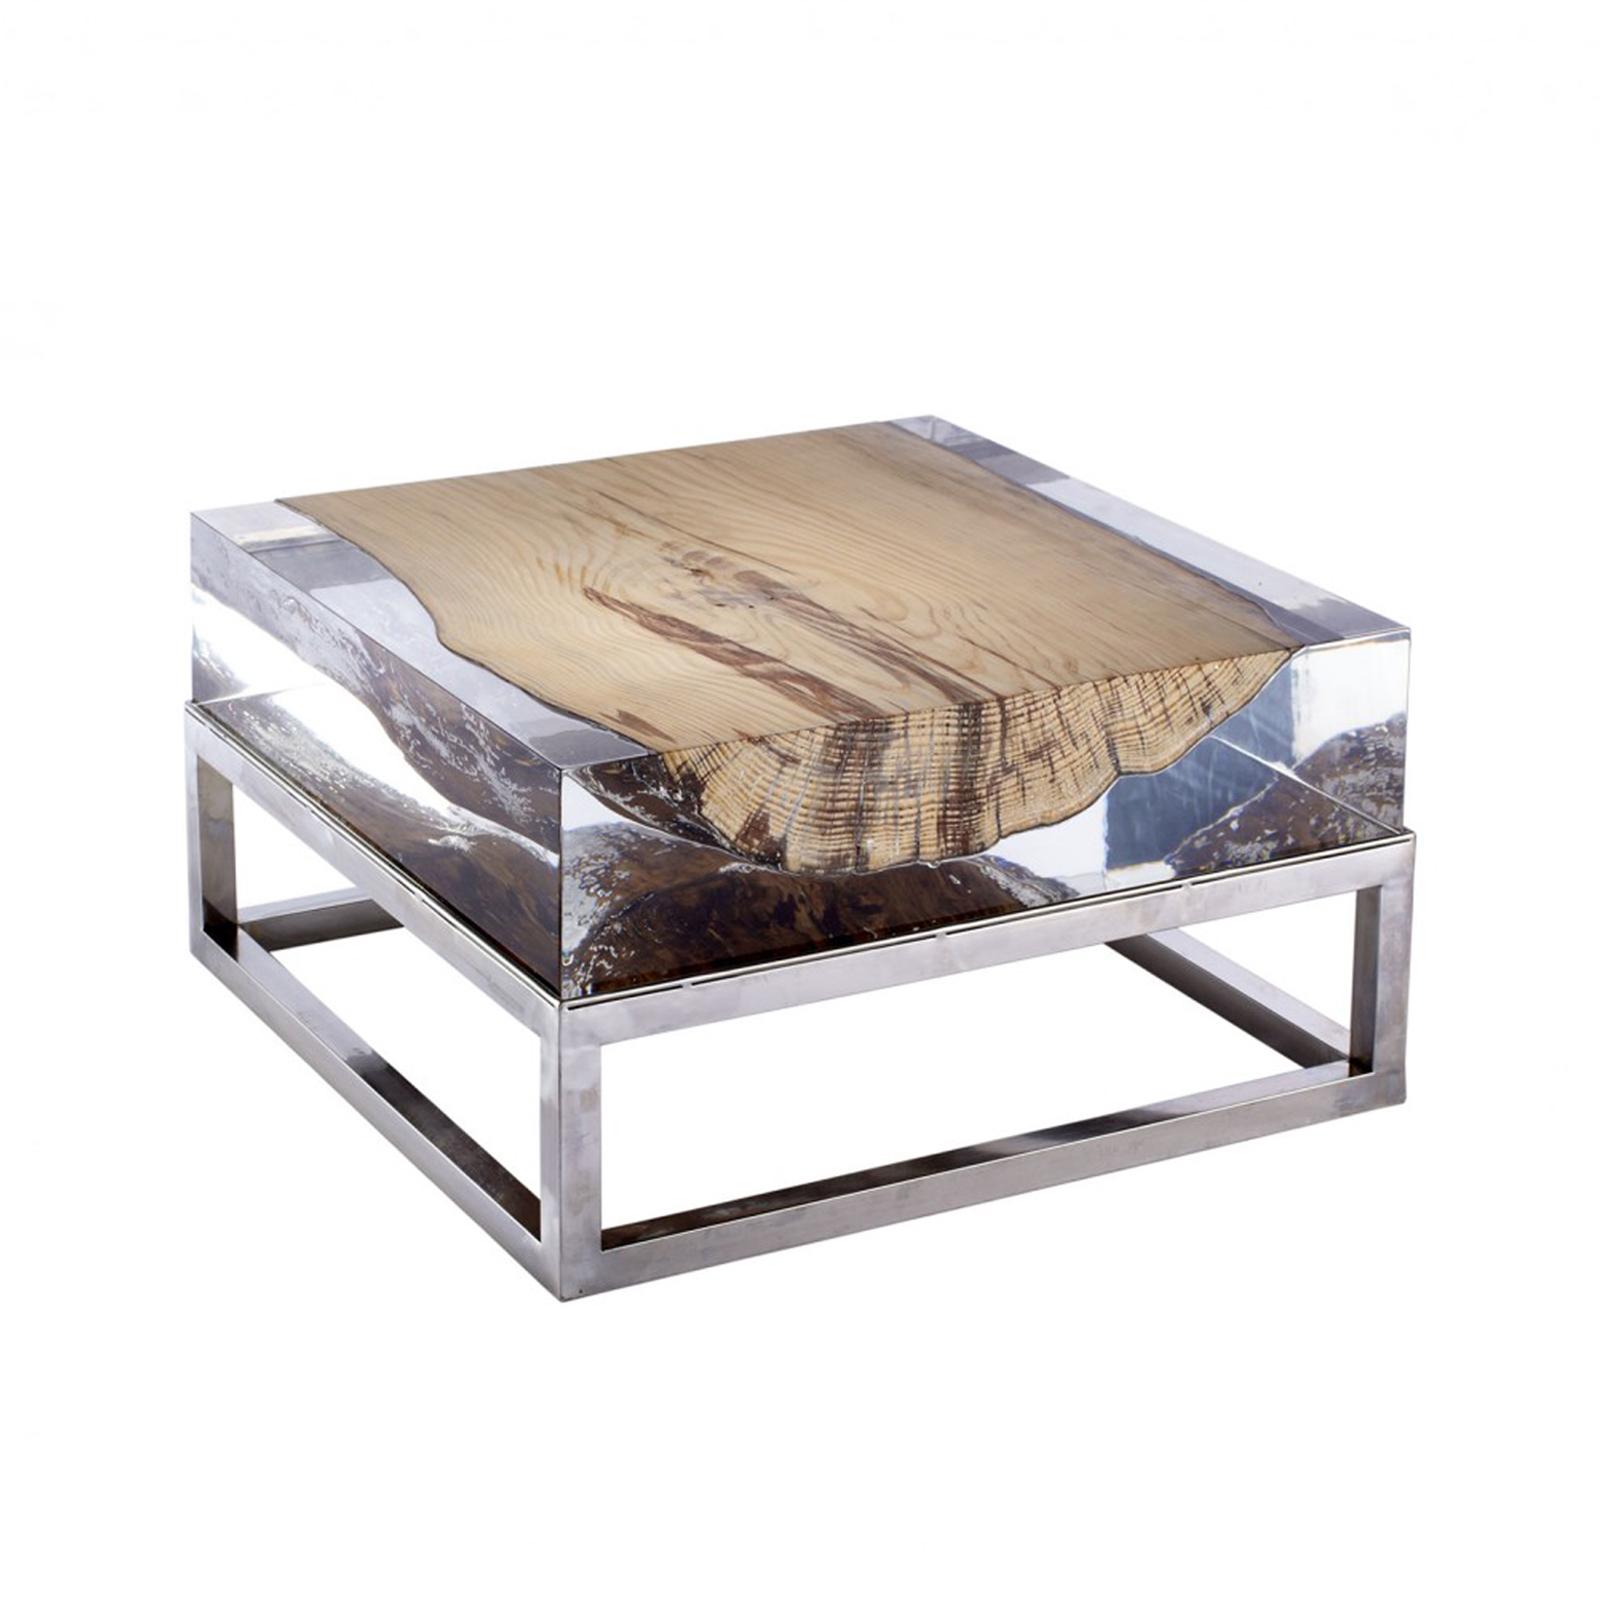 michael dawkins home, lucite coffee table, theresa seabaugh interiors, brooklyn interior designer